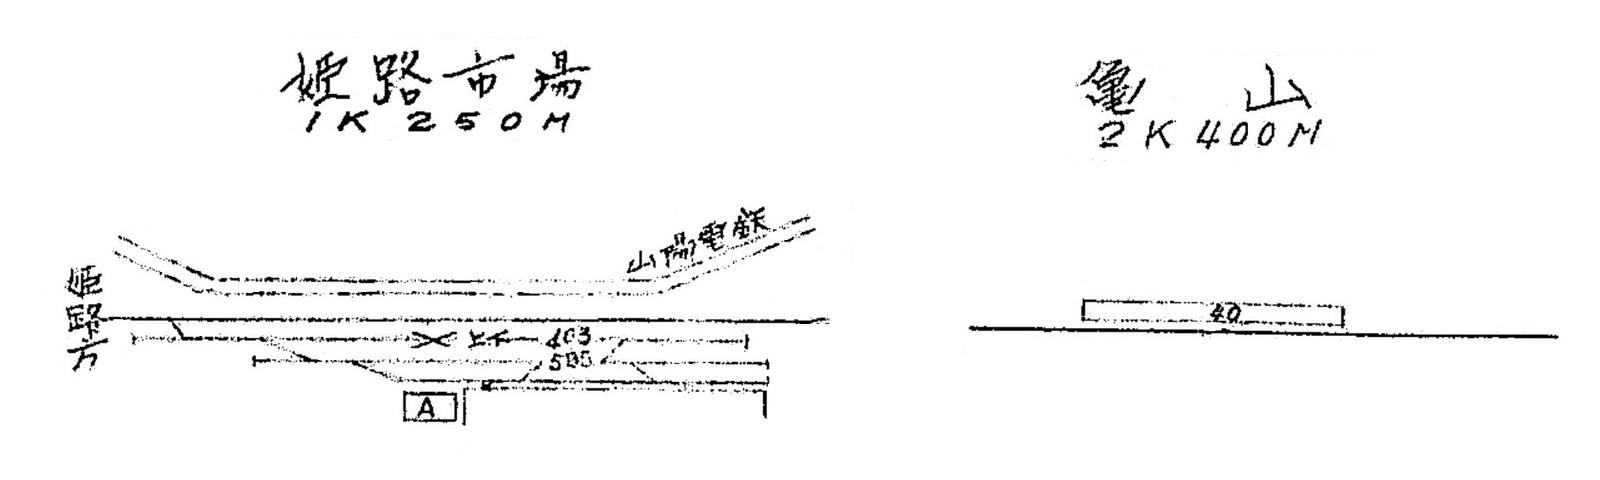 1959011